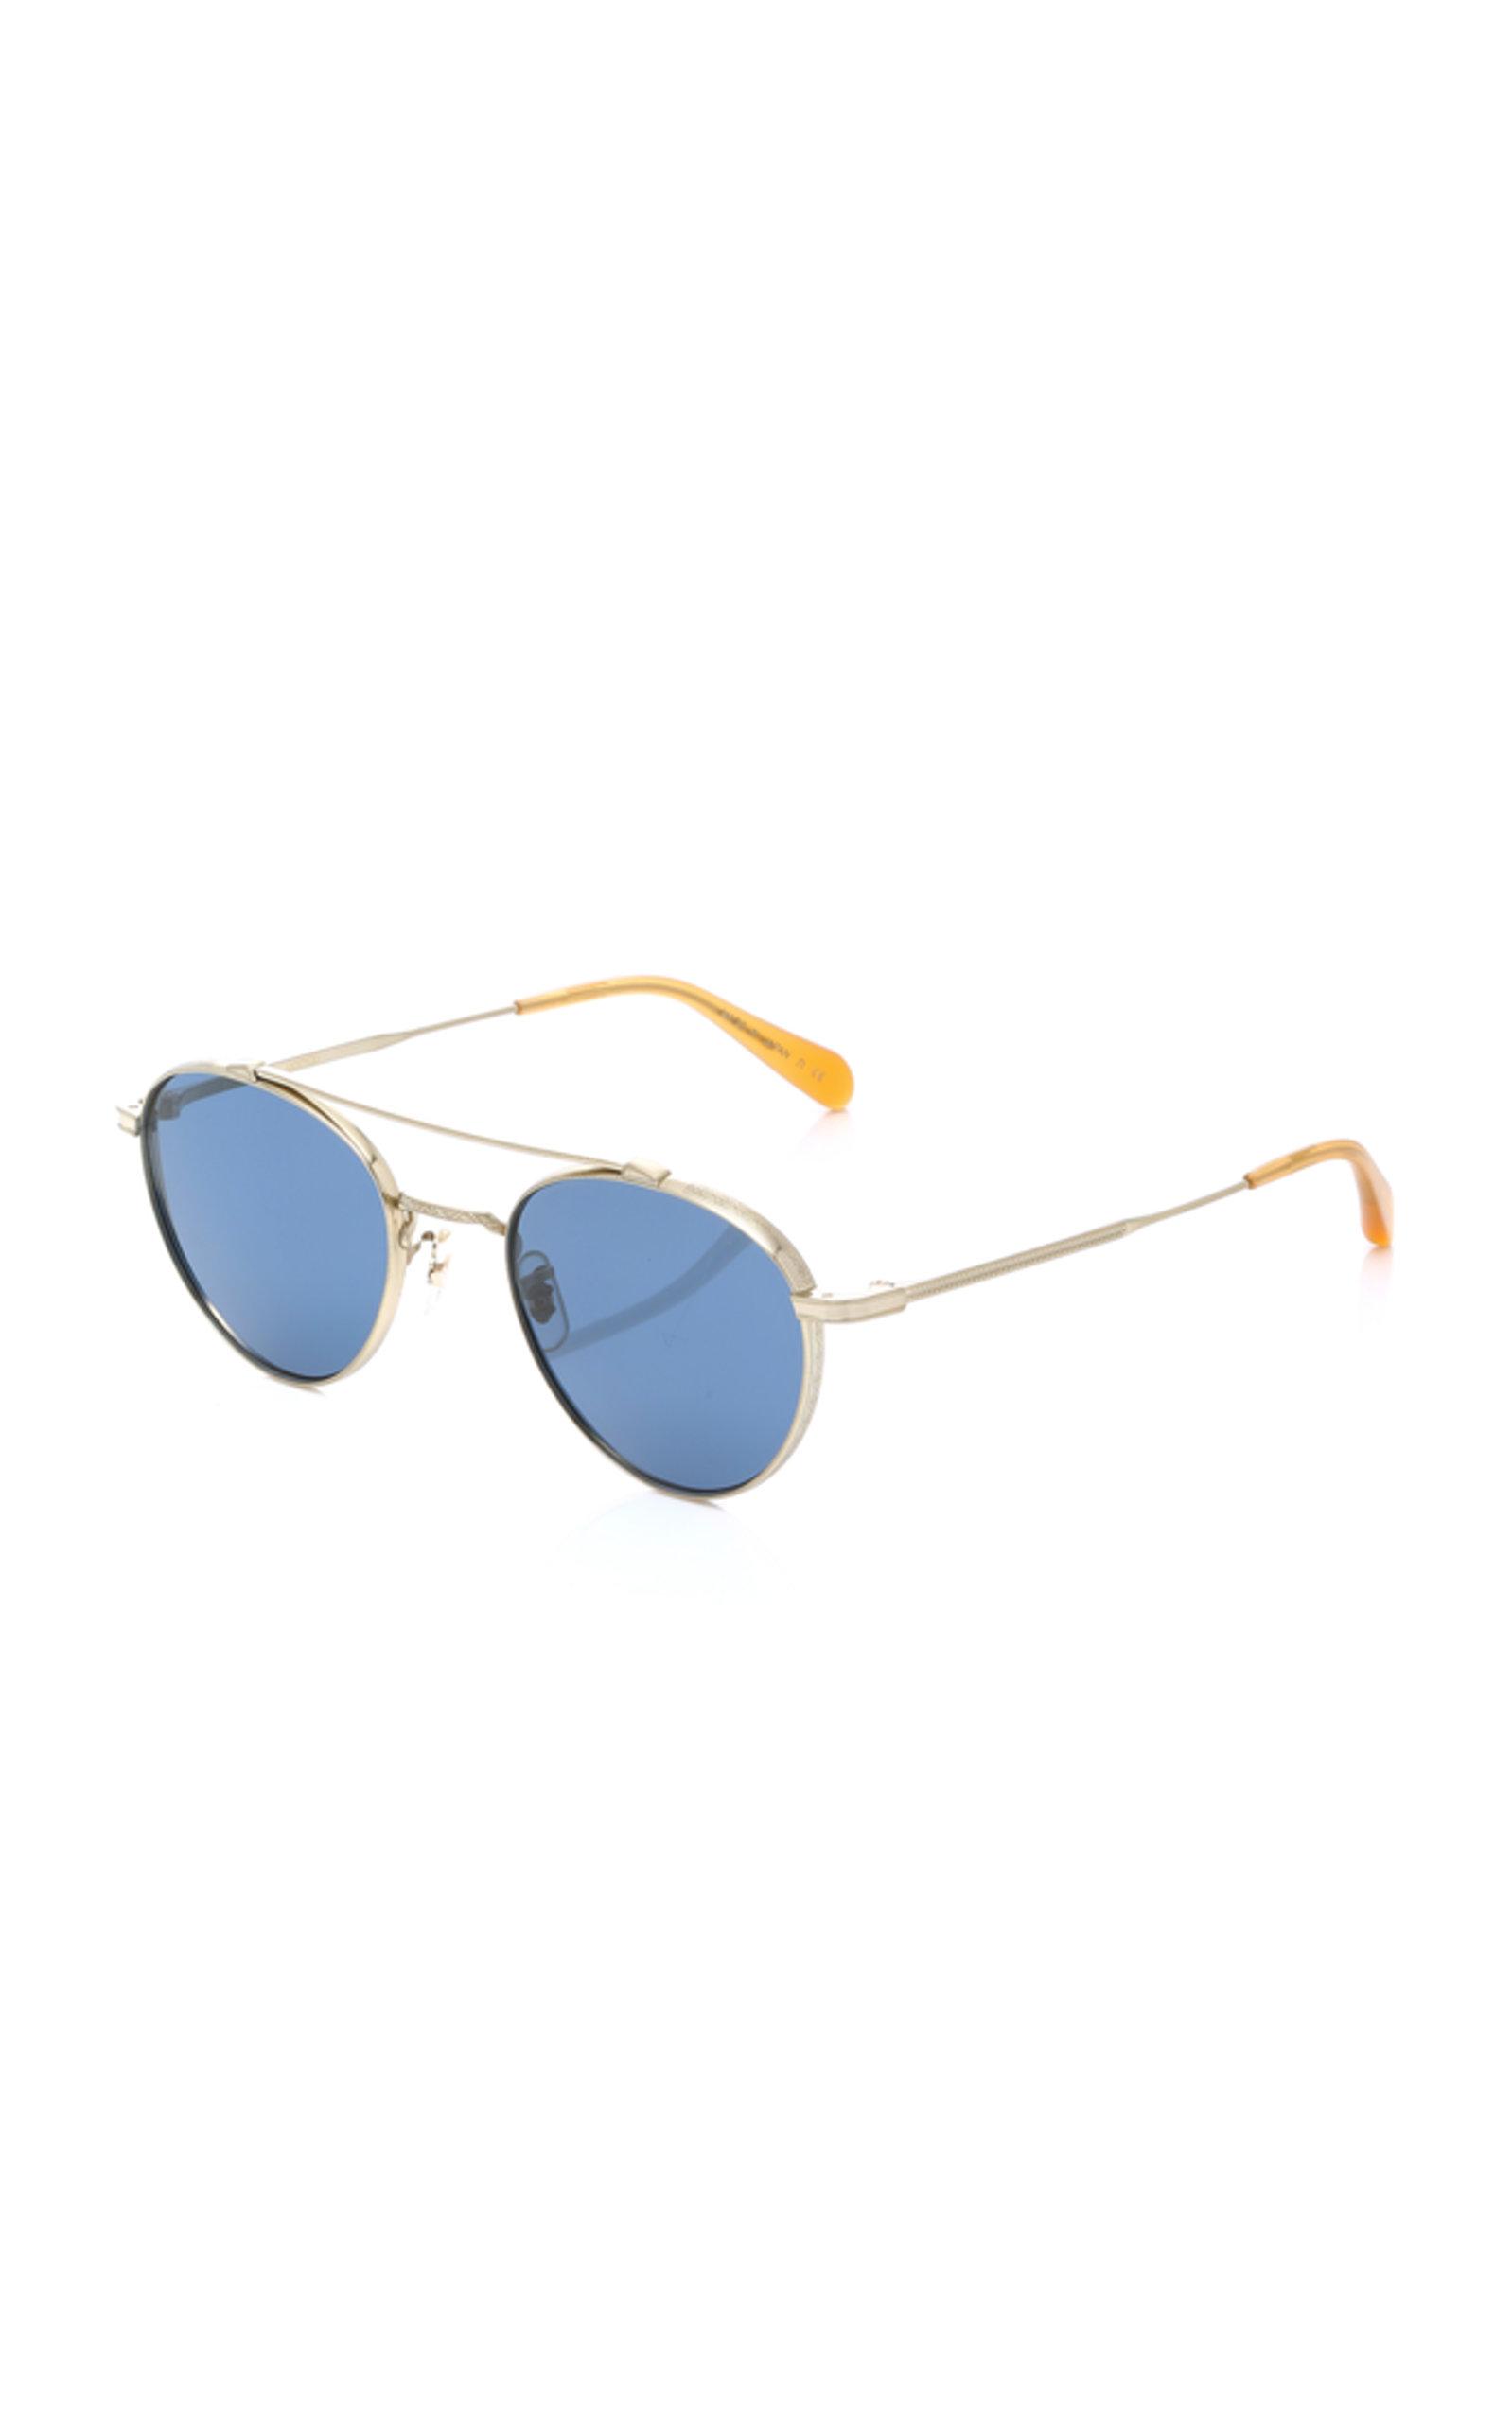 3dd5c4989e174 Oliver PeoplesWatts Round Aviator Sunglasses. CLOSE. Loading. Loading